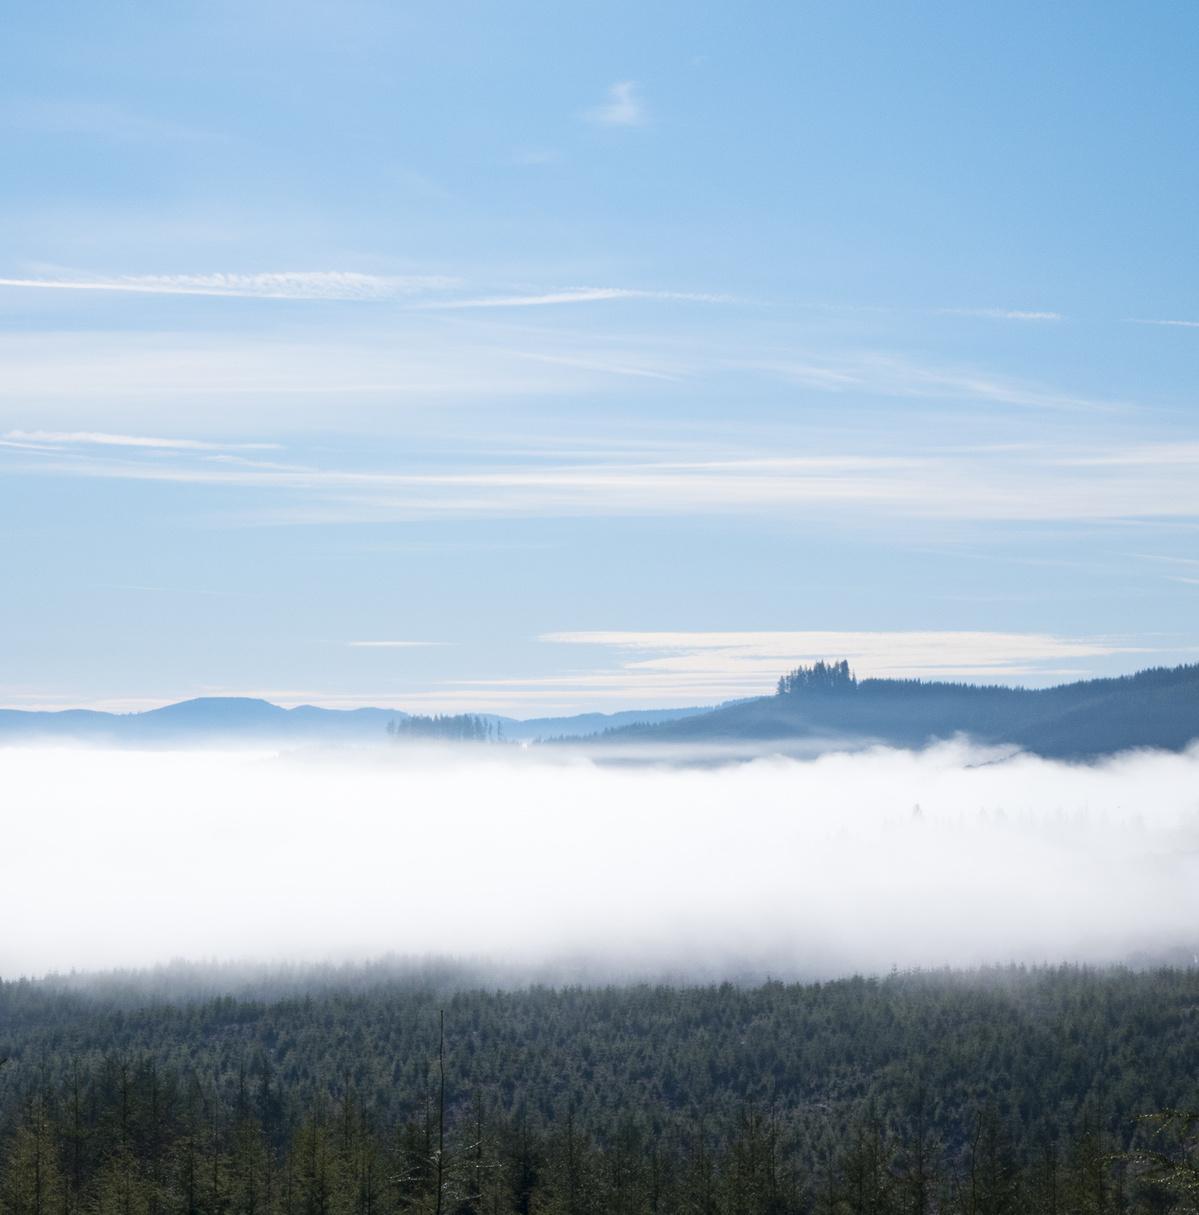 lowland fogs